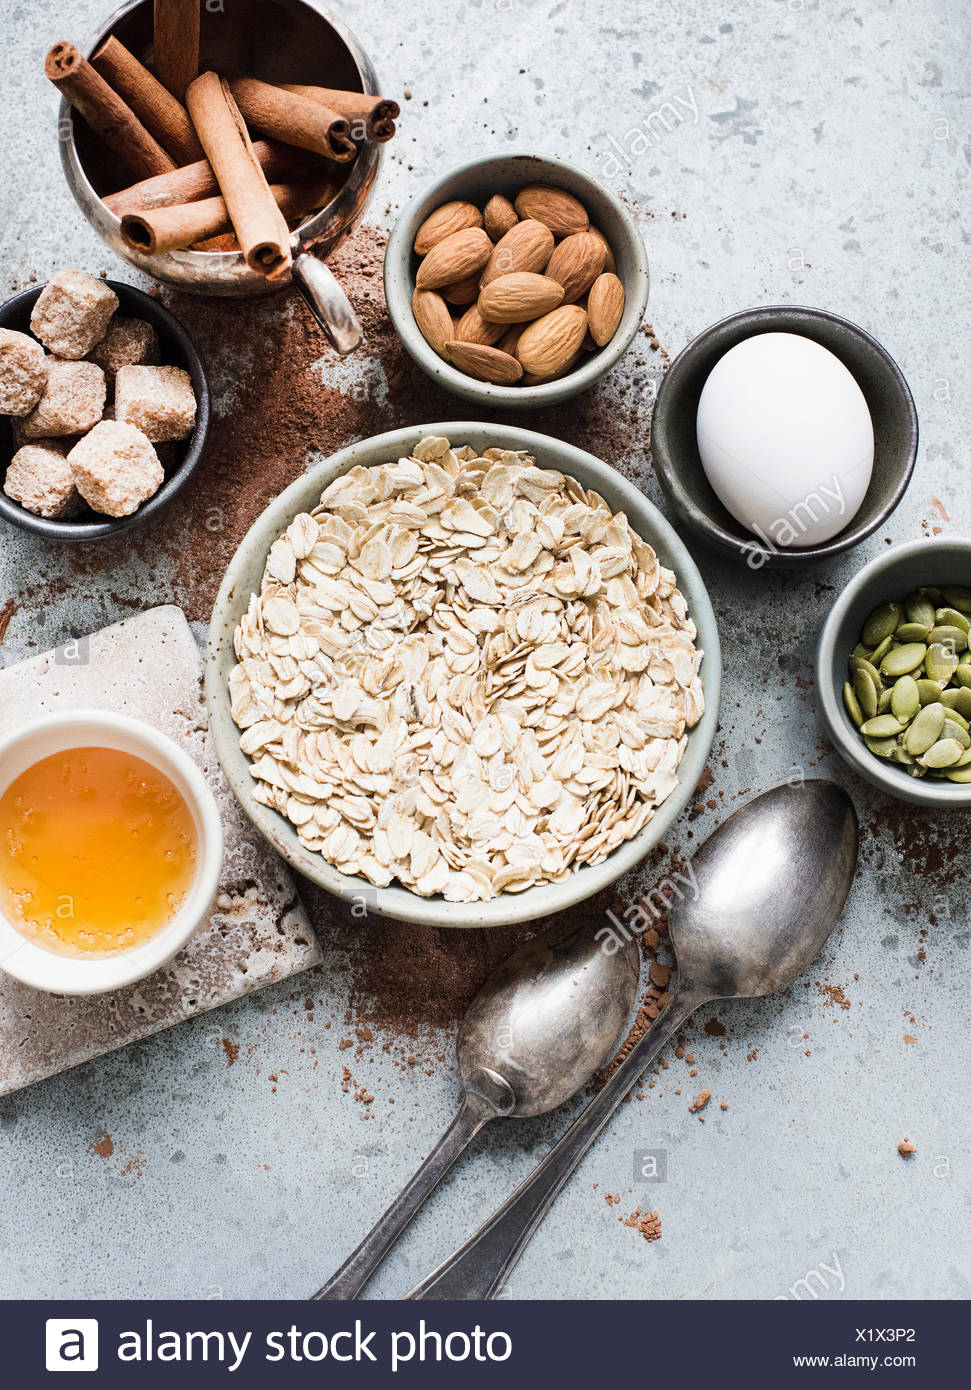 Ingredienti per una sana i cookie Immagini Stock